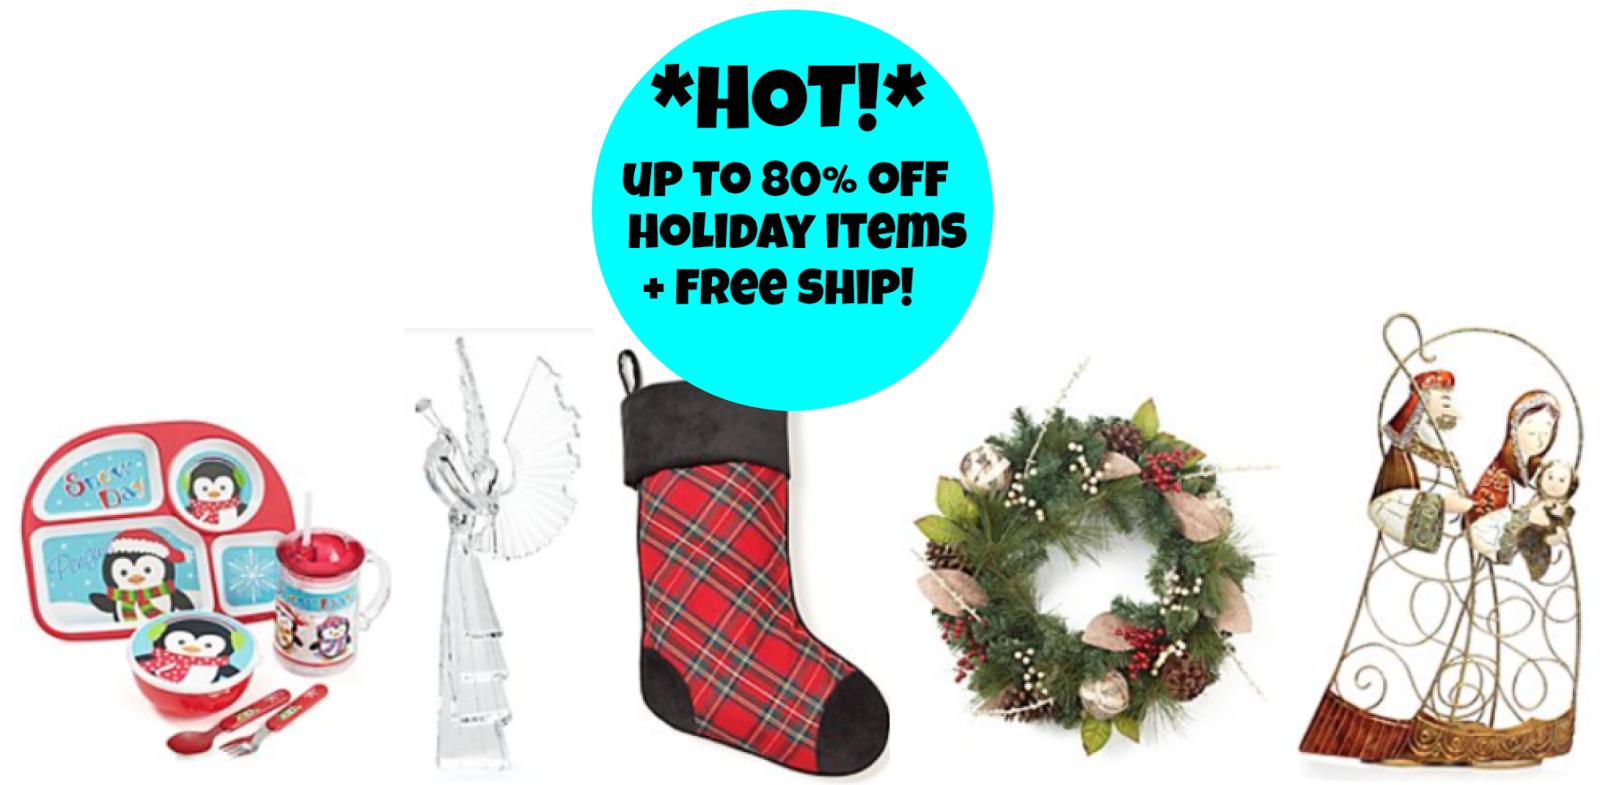 http://www.thebinderladies.com/2015/01/hot-bonton-up-to-80-off-holiday-items.html#.VK2V2ofduyM